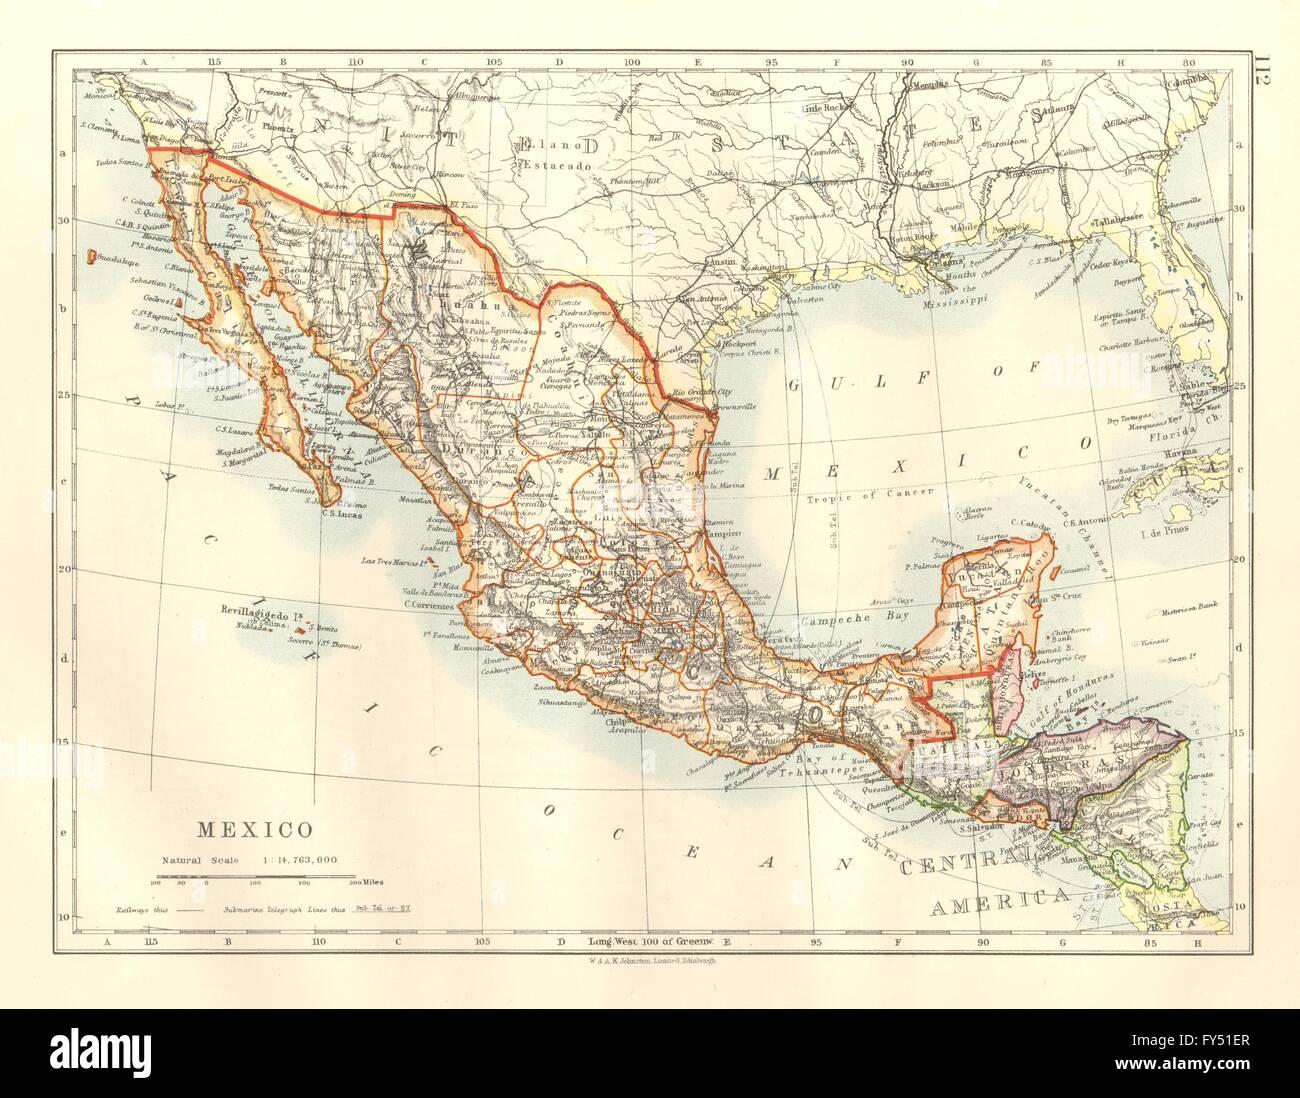 Honduras Mexico Map.Mexico Central America Guatemala British Honduras Nicaragua Stock